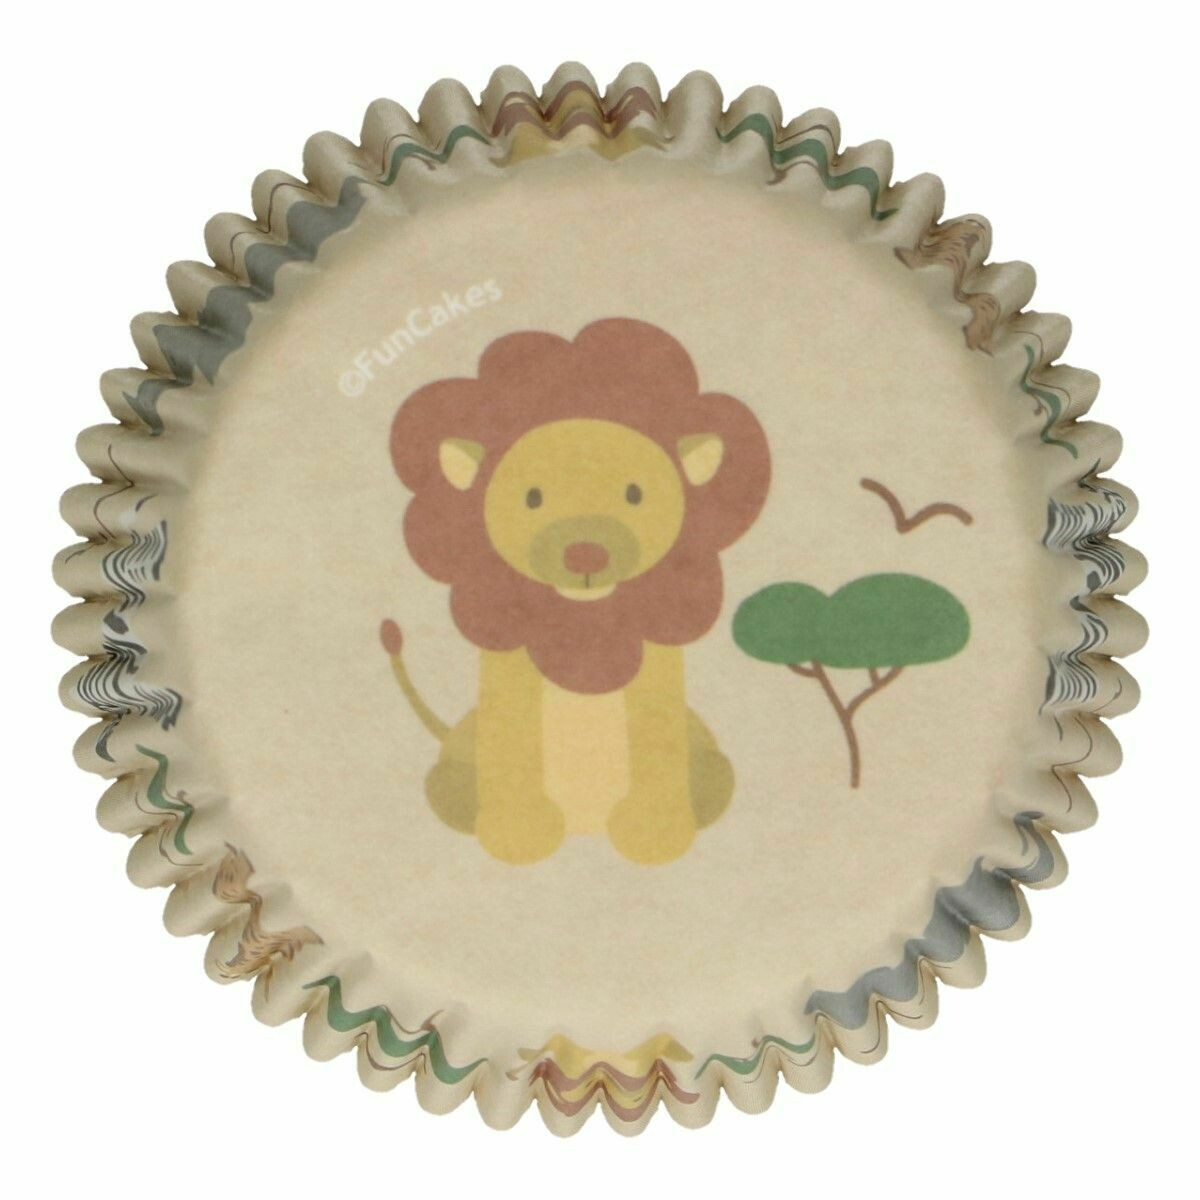 FunCakes Cupcake Cases -SAFARI ANIMALS -Θήκες Ψησίματος 48 τεμ - Θέμα Σαφάρι